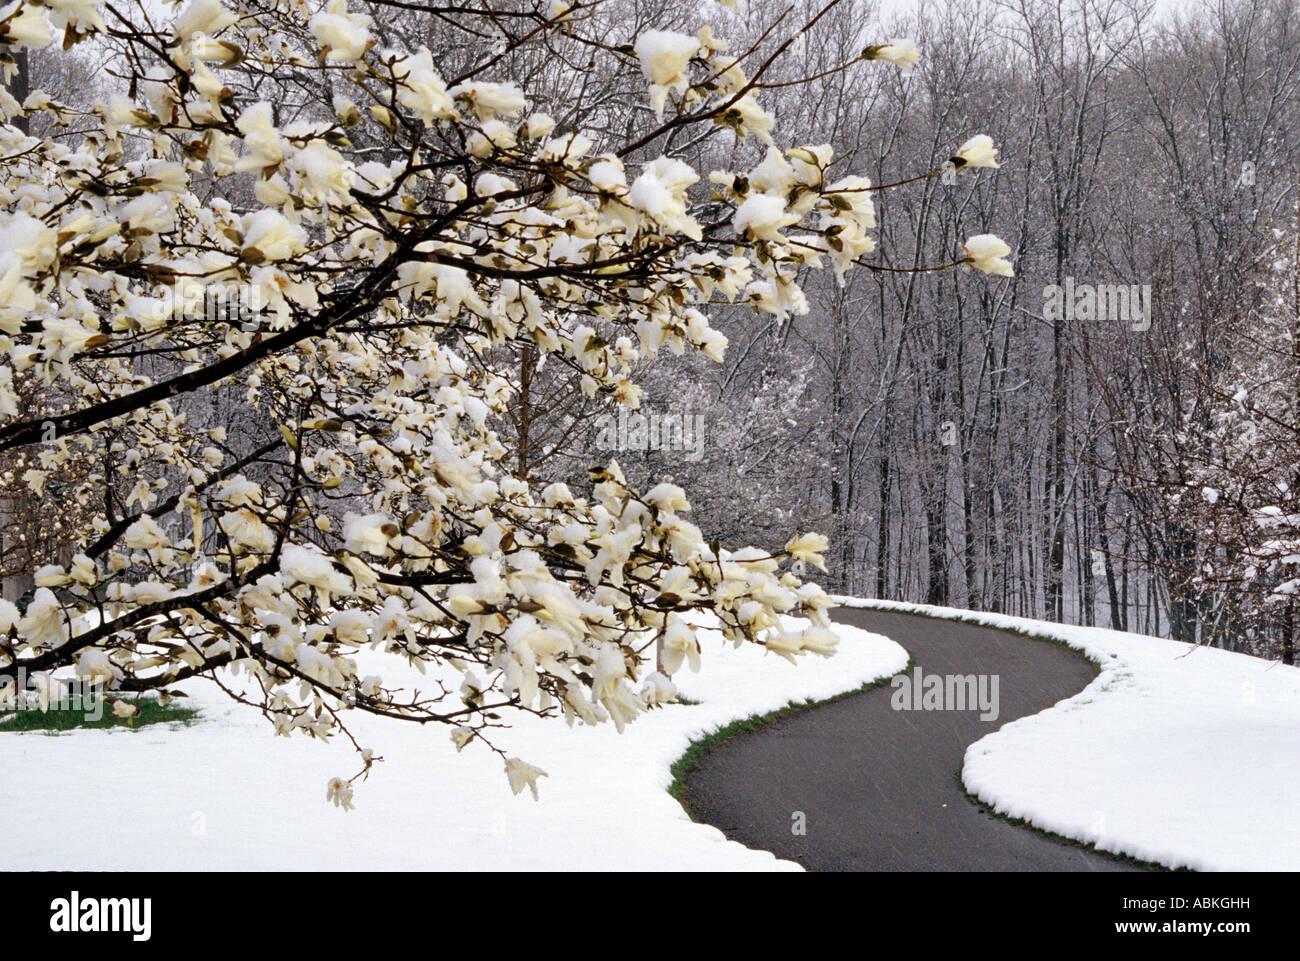 Late Spring Snow And Magnolia Tree At Minnesota Landscape Arboretum